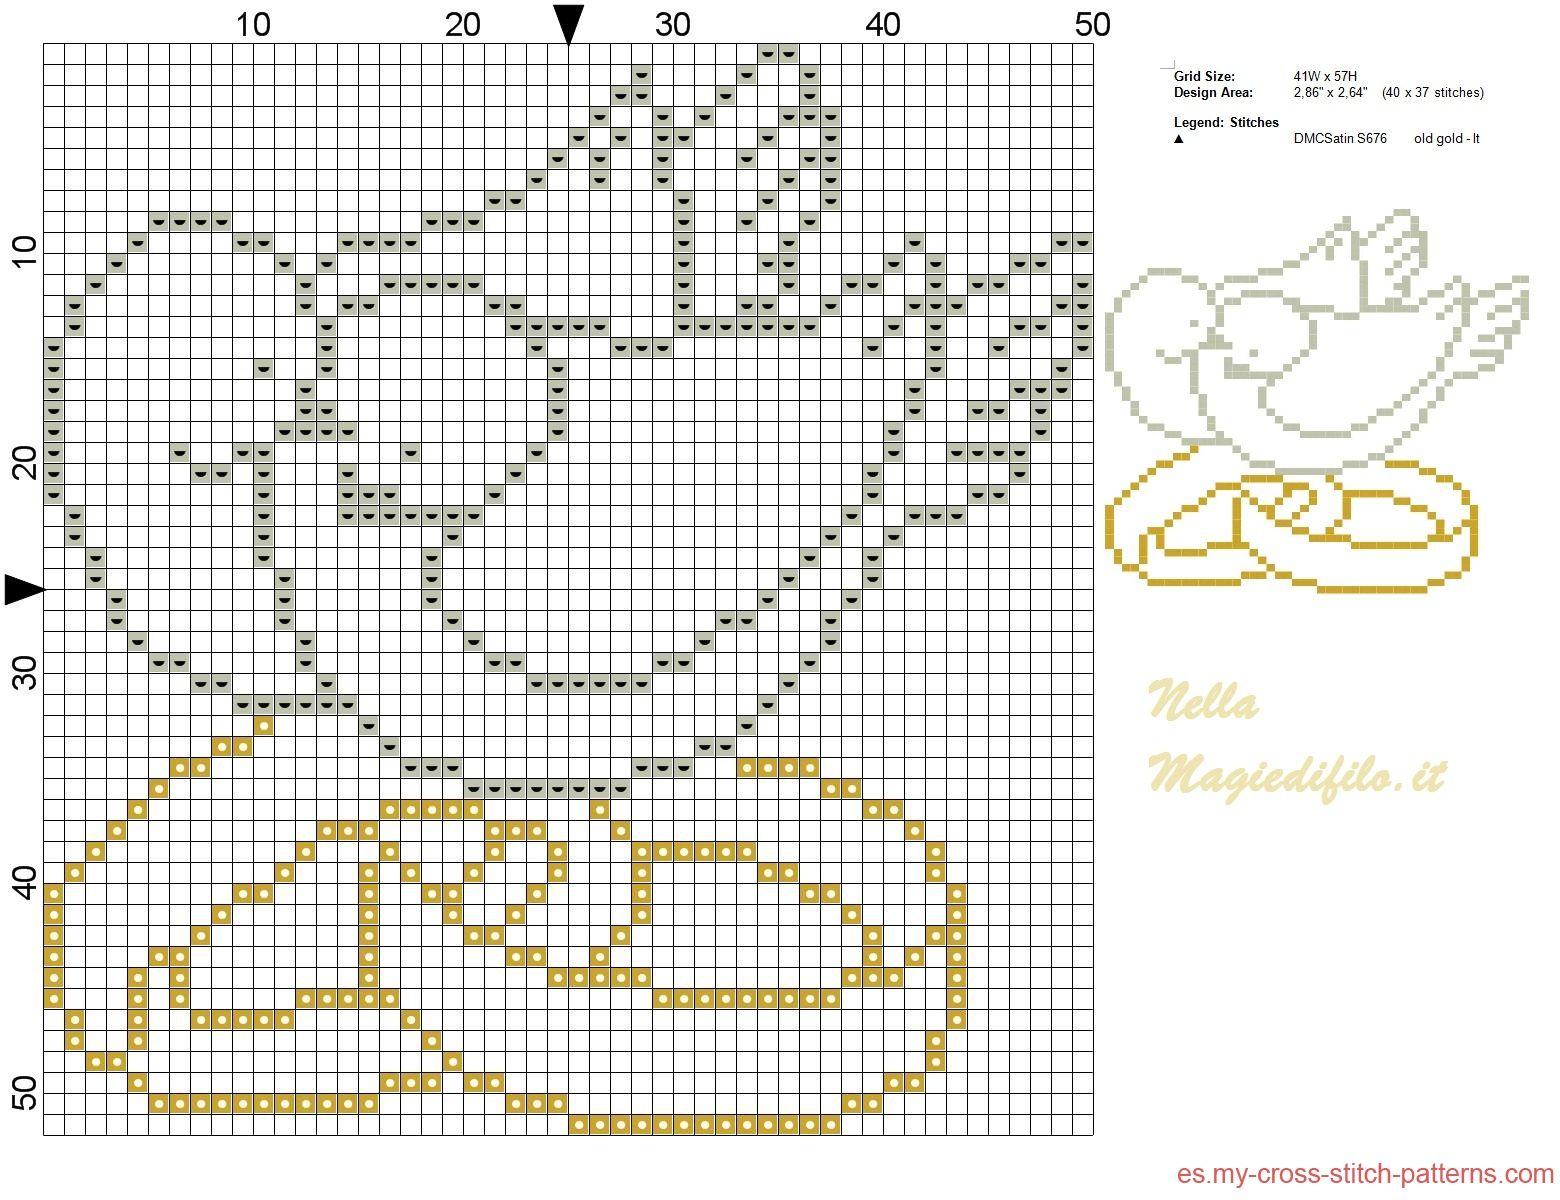 Palomas con los anillos | ima | Pinterest | Stickmuster, Kreuzstich ...